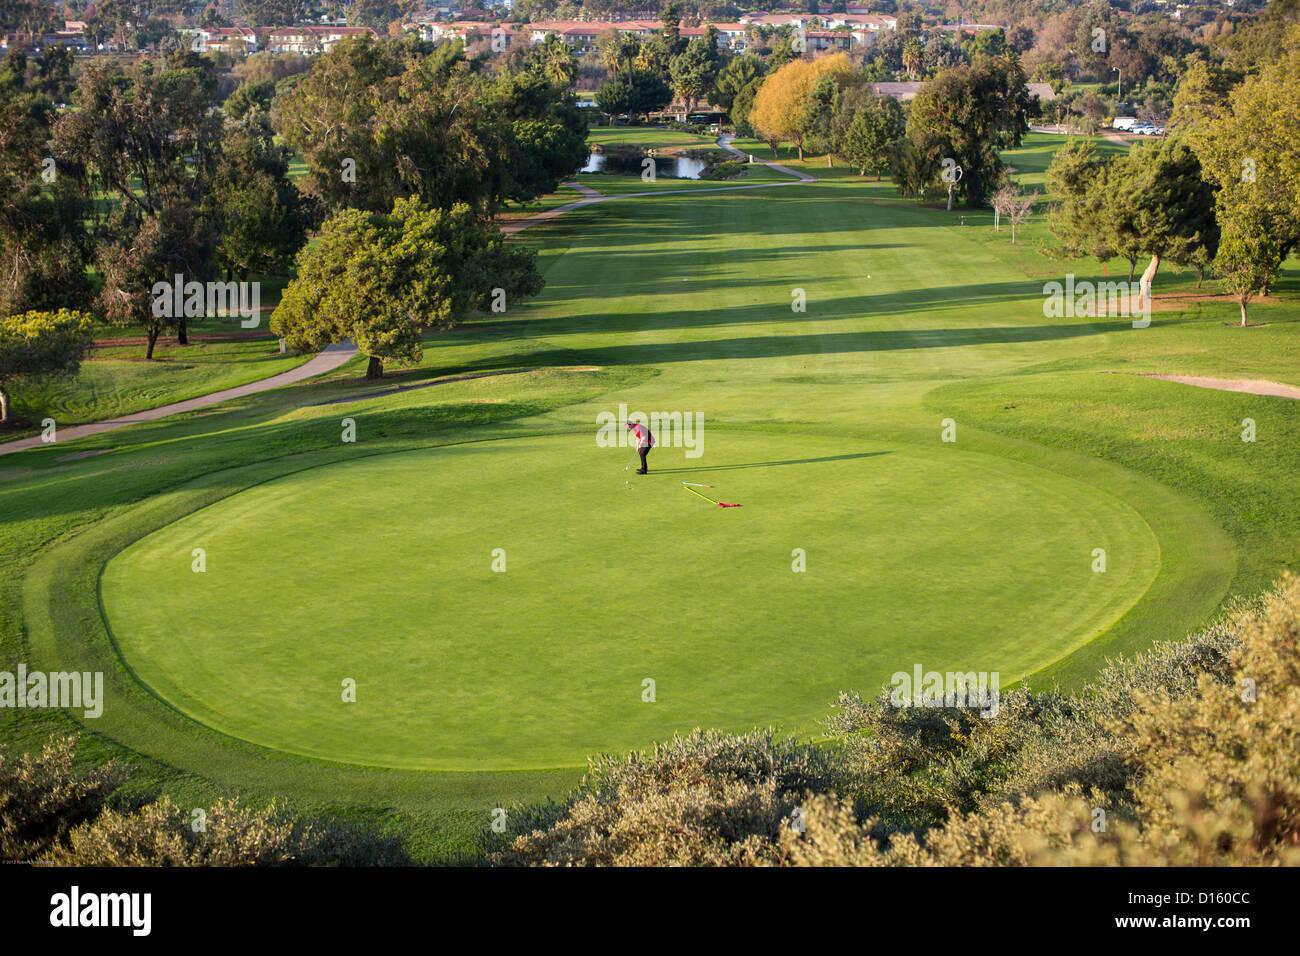 Un golfista putts en una zona verde en el San Juan Hills Golf Course en San Juan Capistrano, California. Imagen De Stock